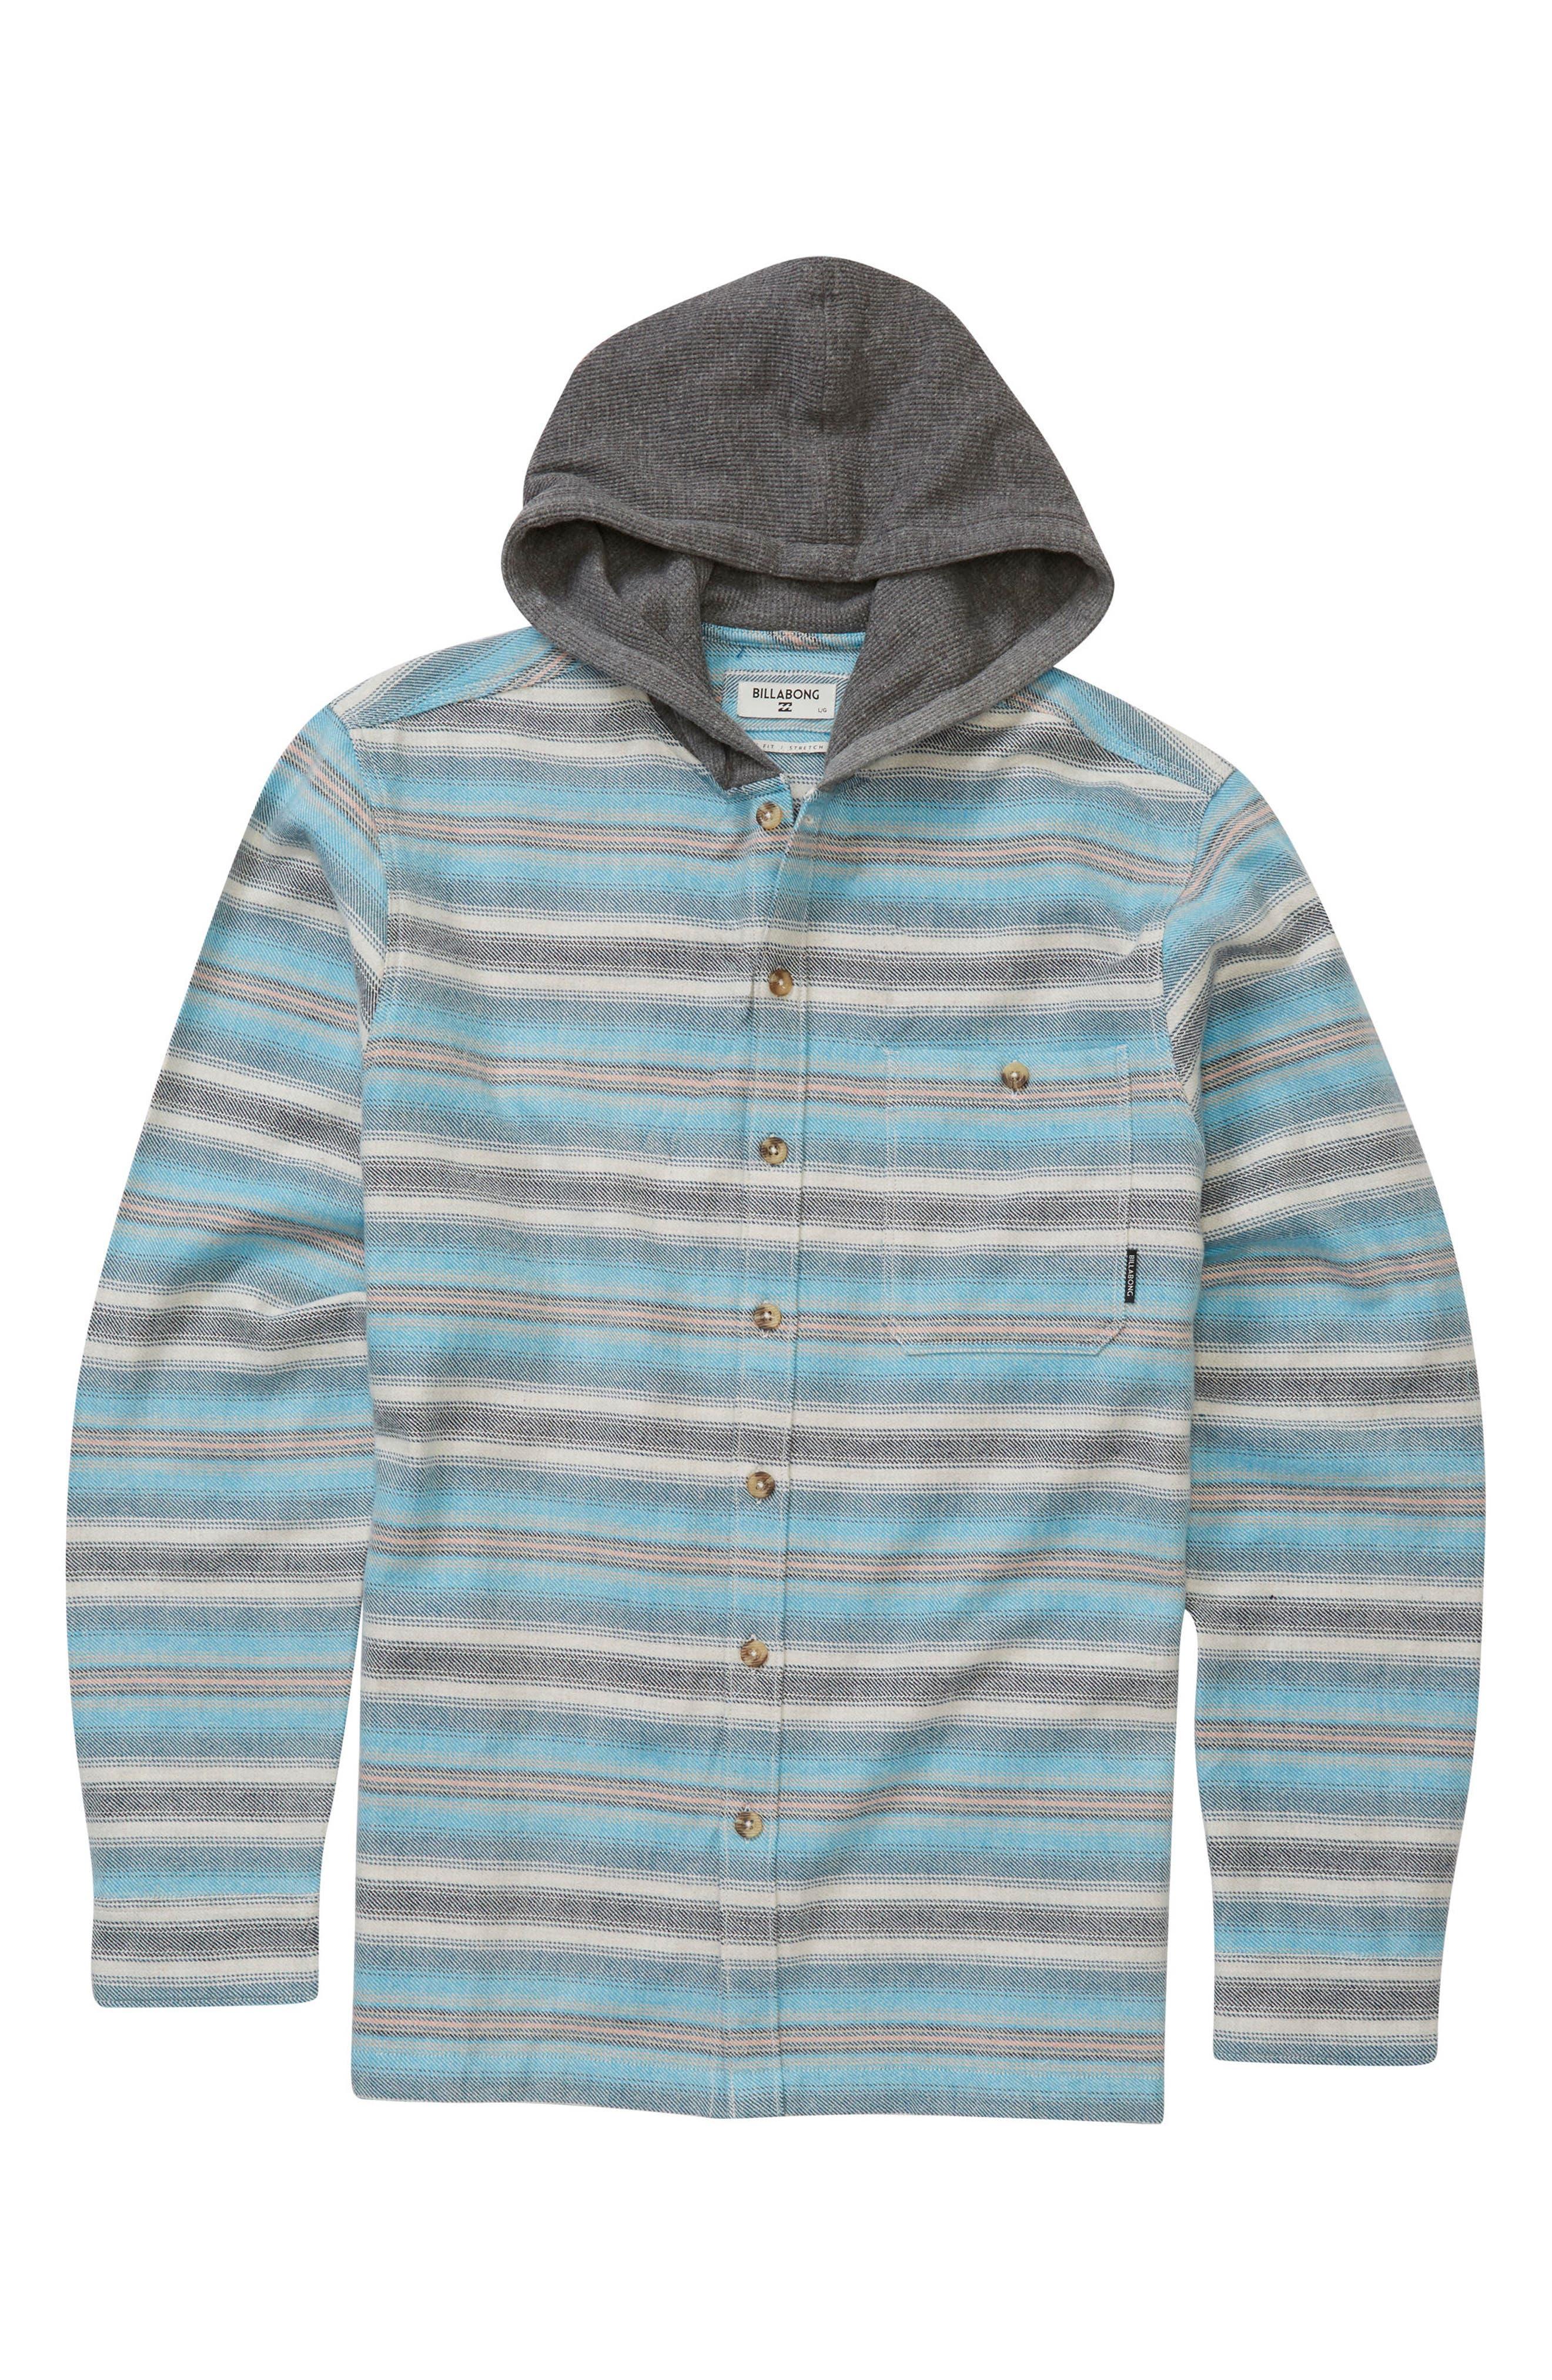 Main Image - Billabong Baja Hooded Shirt (Toddler Boys & Little Boys)